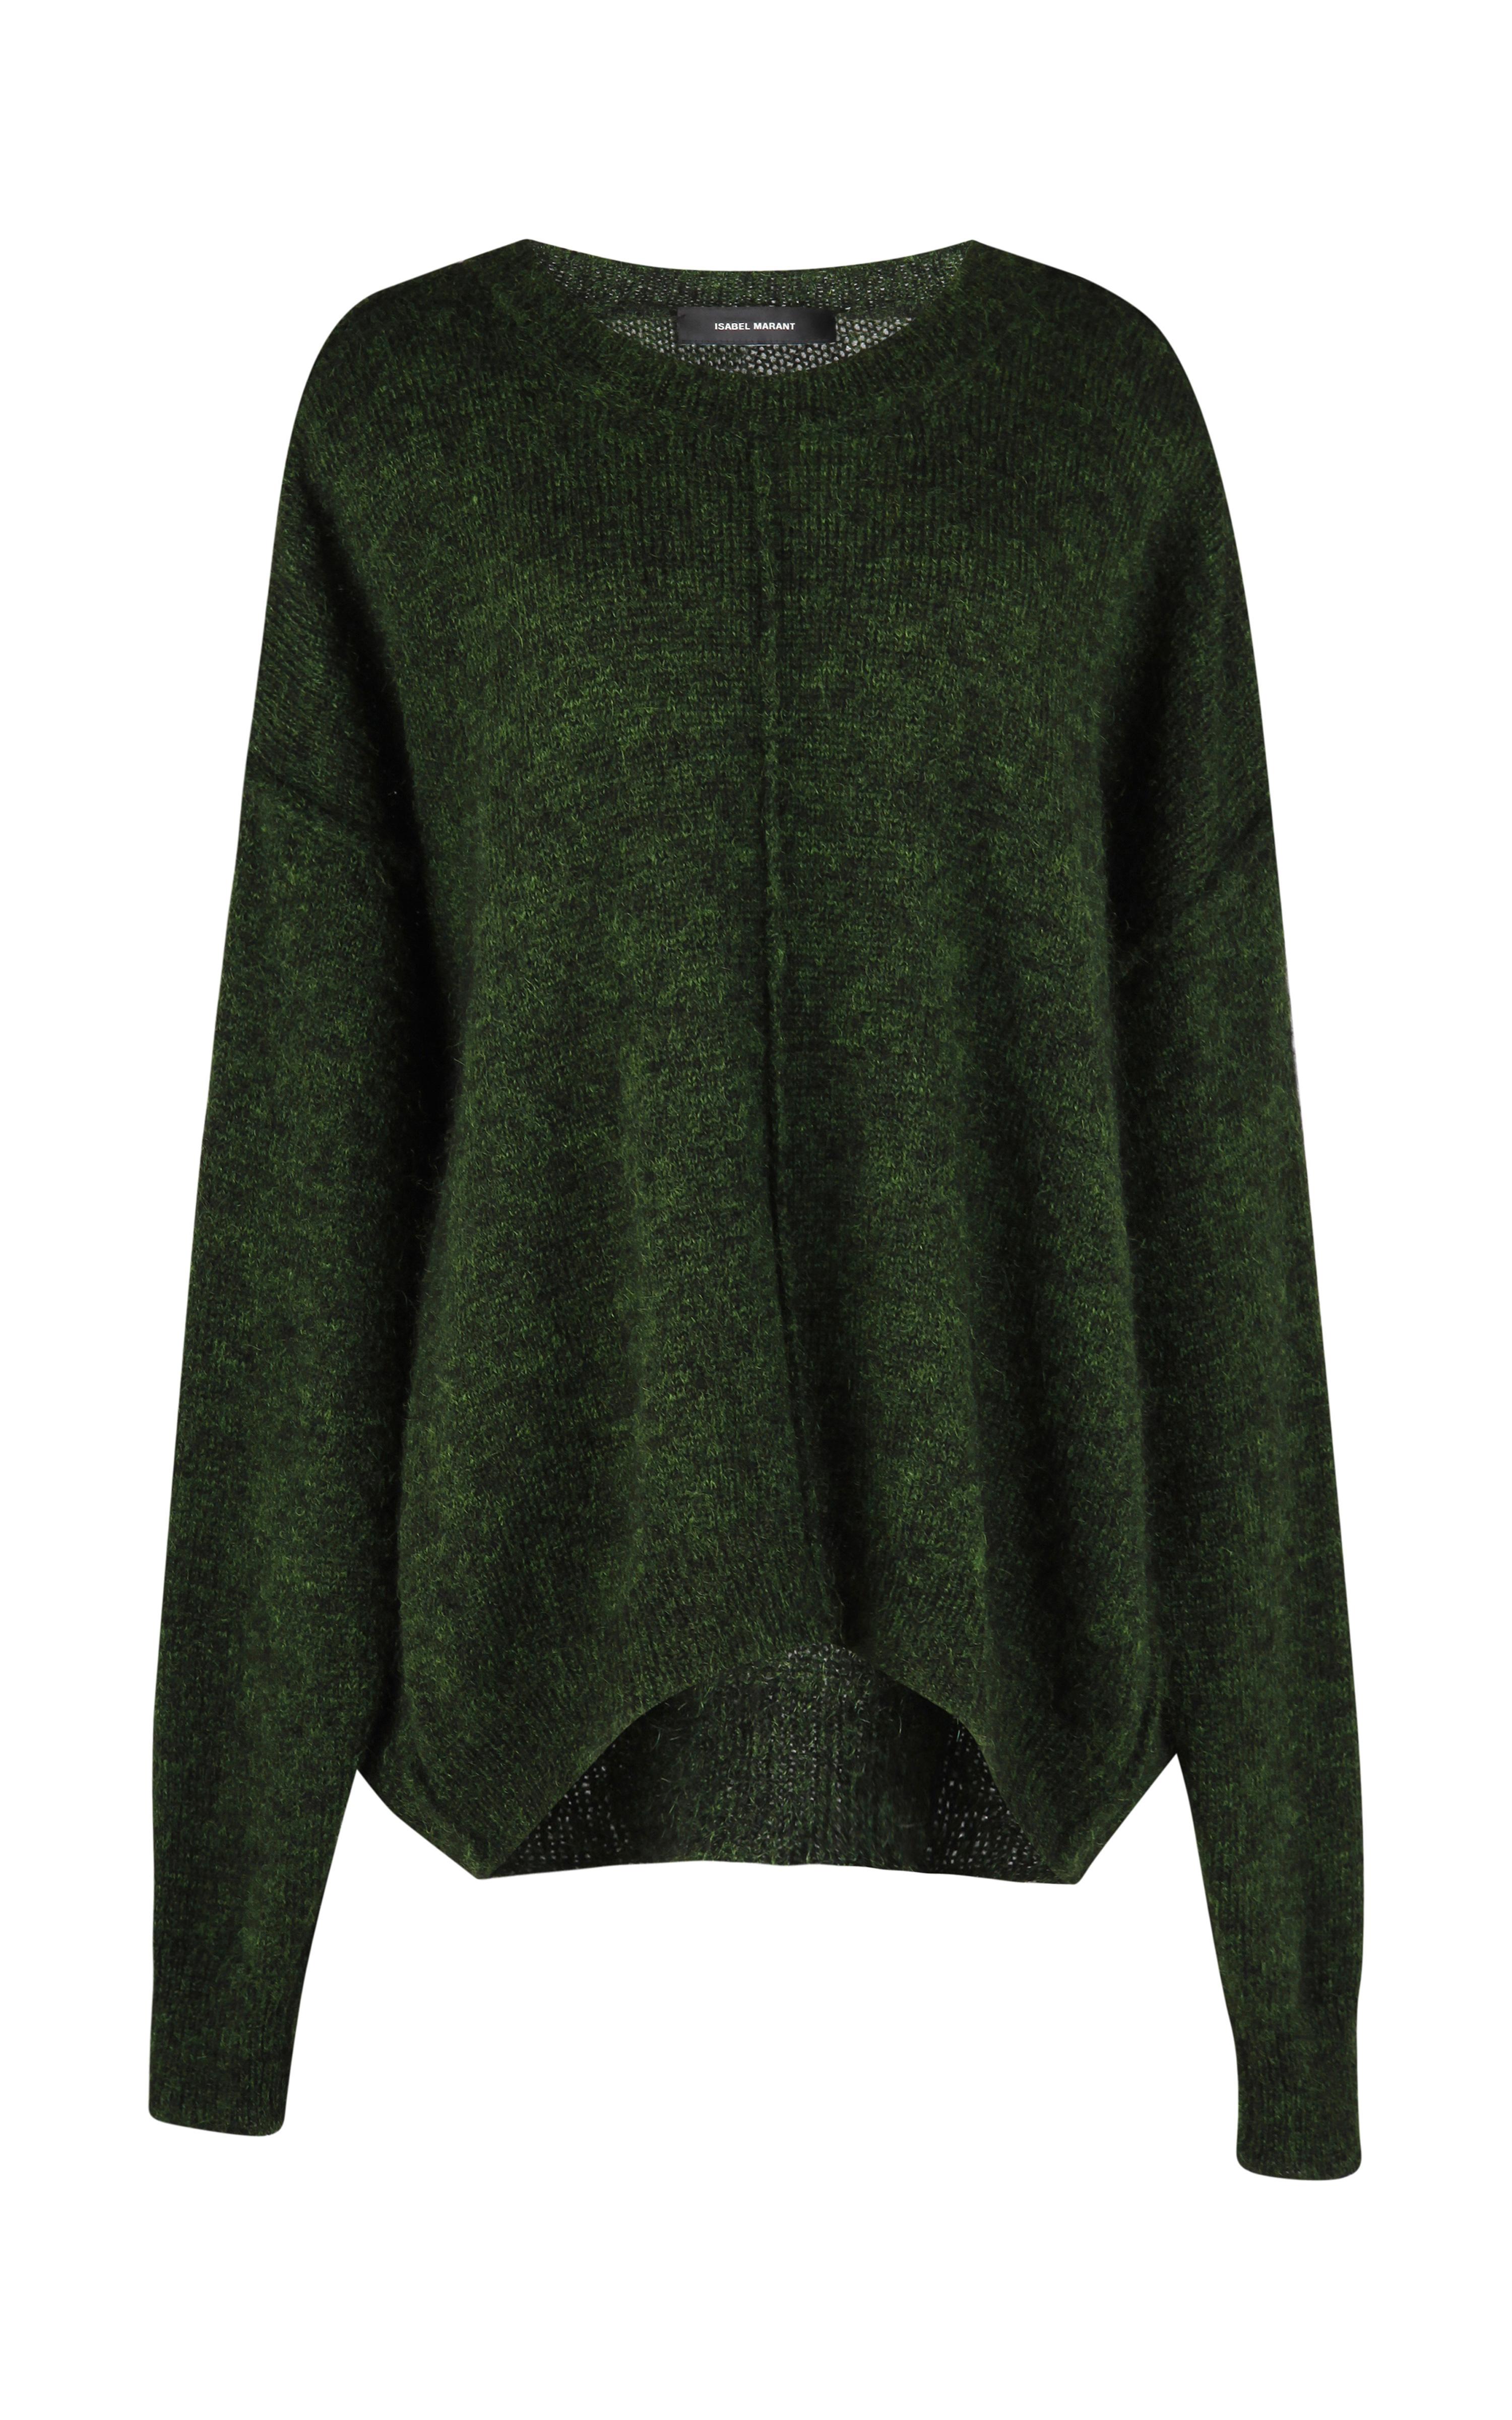 isabel marant tam sweater in green lyst. Black Bedroom Furniture Sets. Home Design Ideas